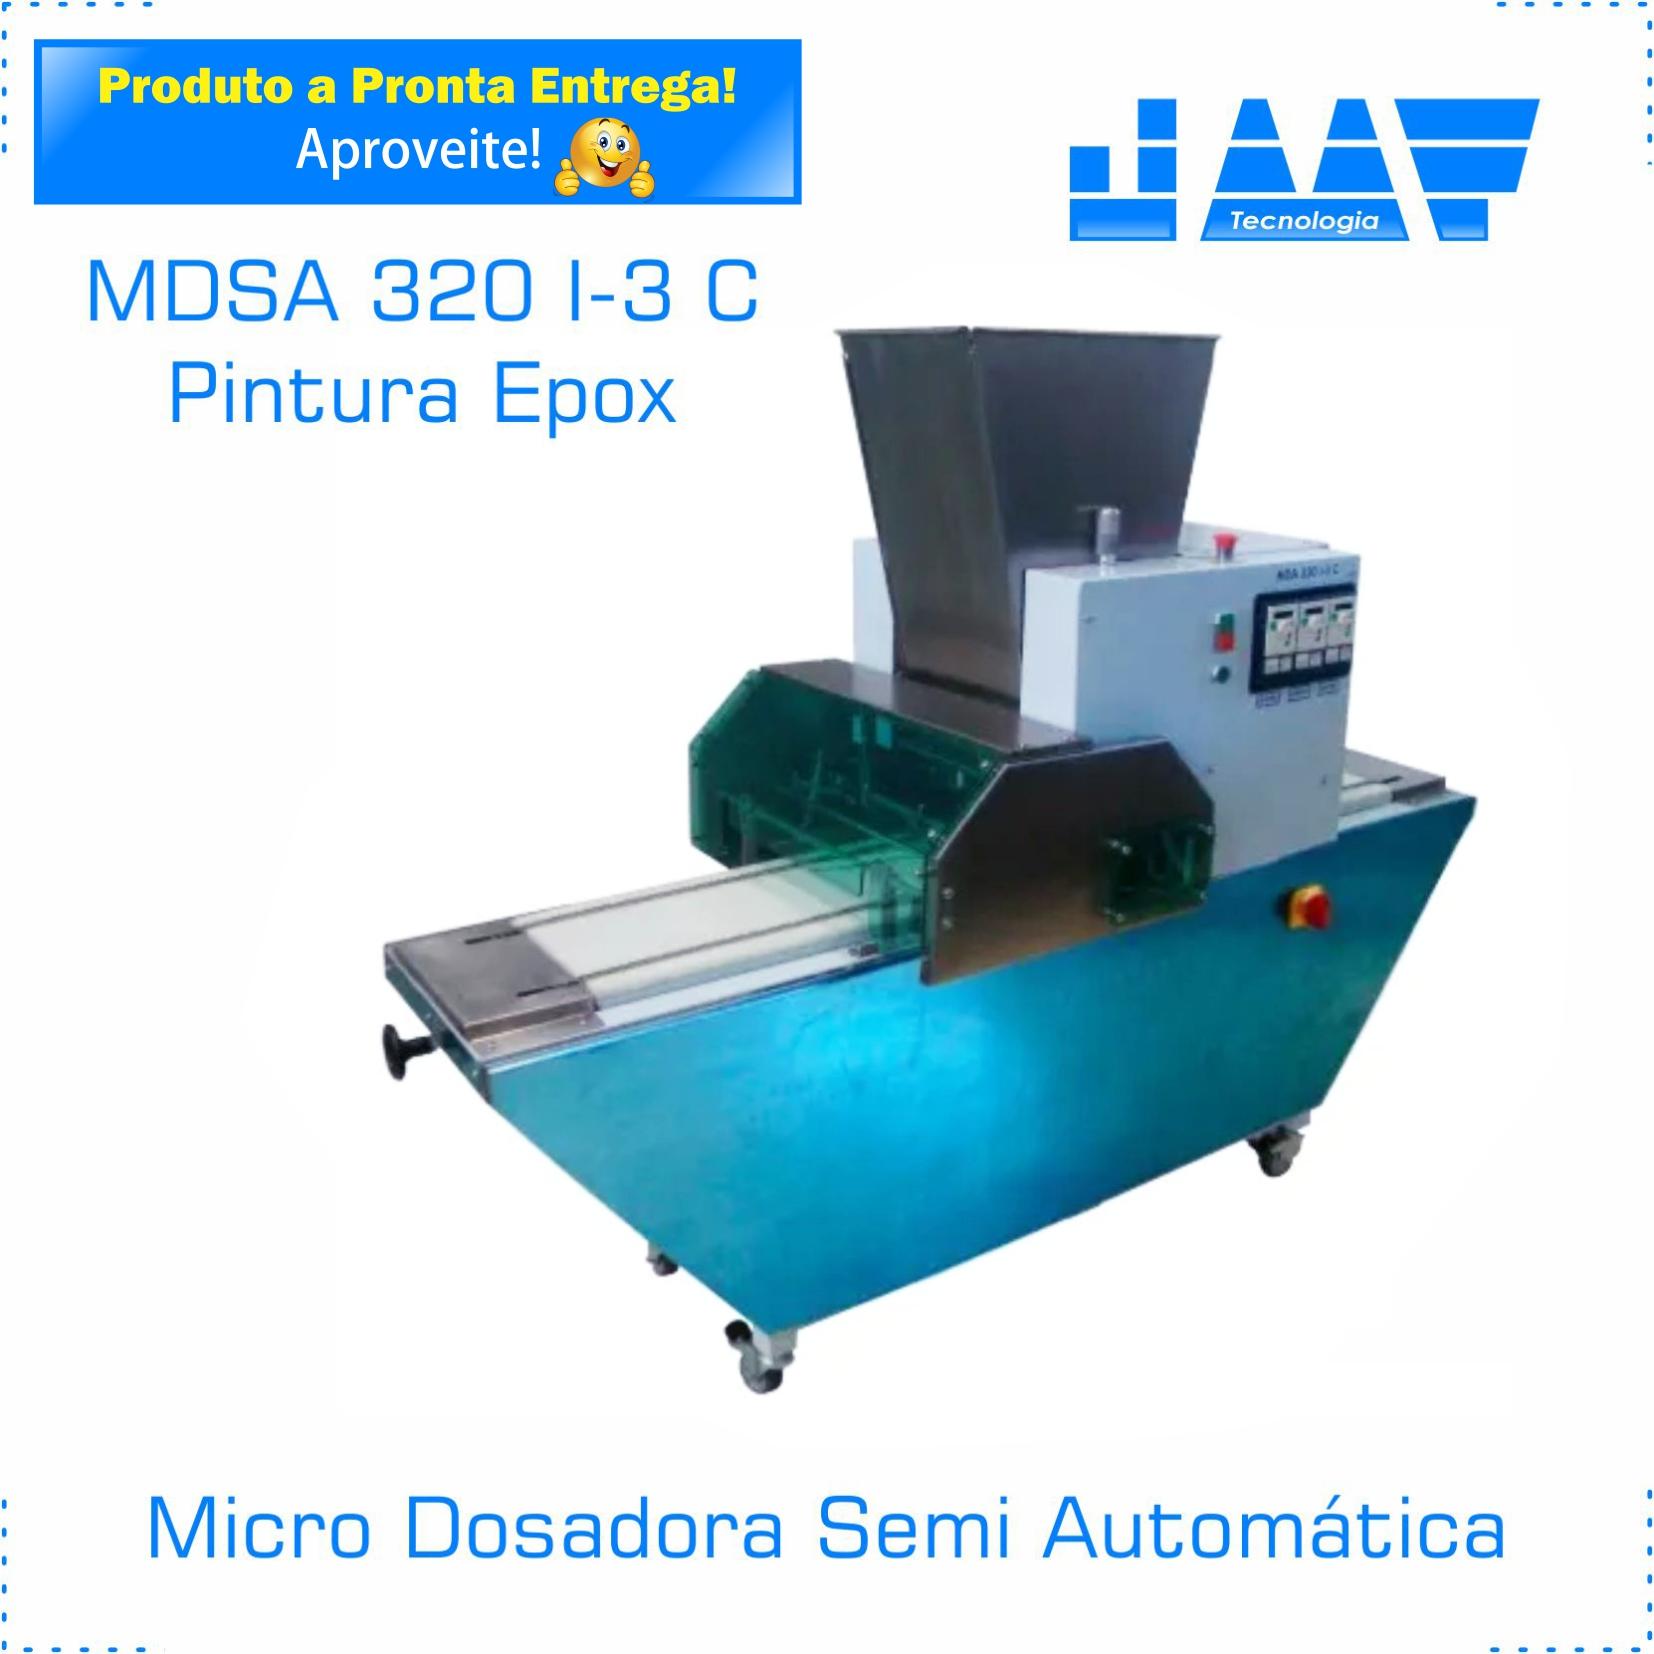 Micro Dosadora Semi Automática (MDSA 320 I-3 Convencional)